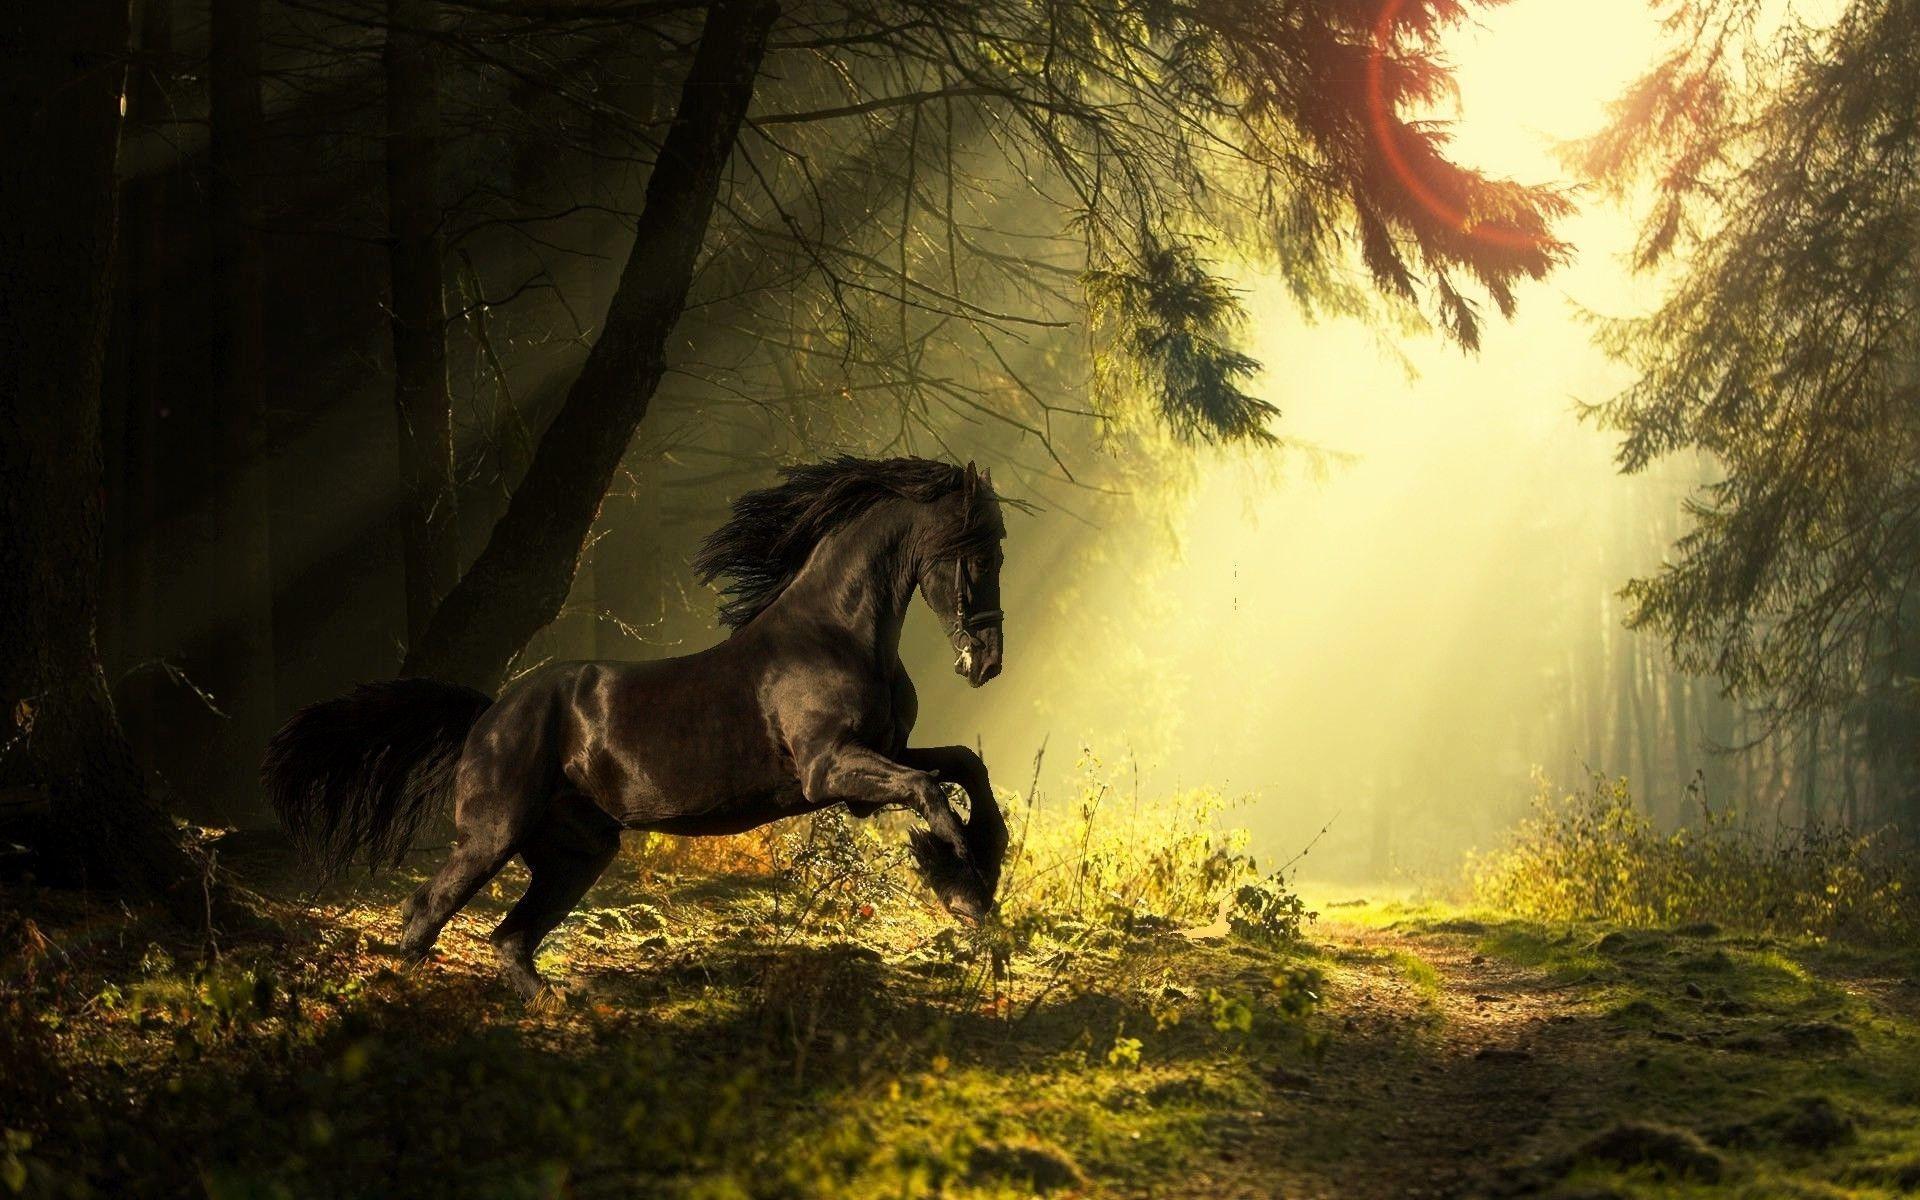 Most Inspiring Wallpaper Halloween Horse - 956747-wallpaper-horse-1920x1200-samsung-galaxy  You Should Have_329234.jpg